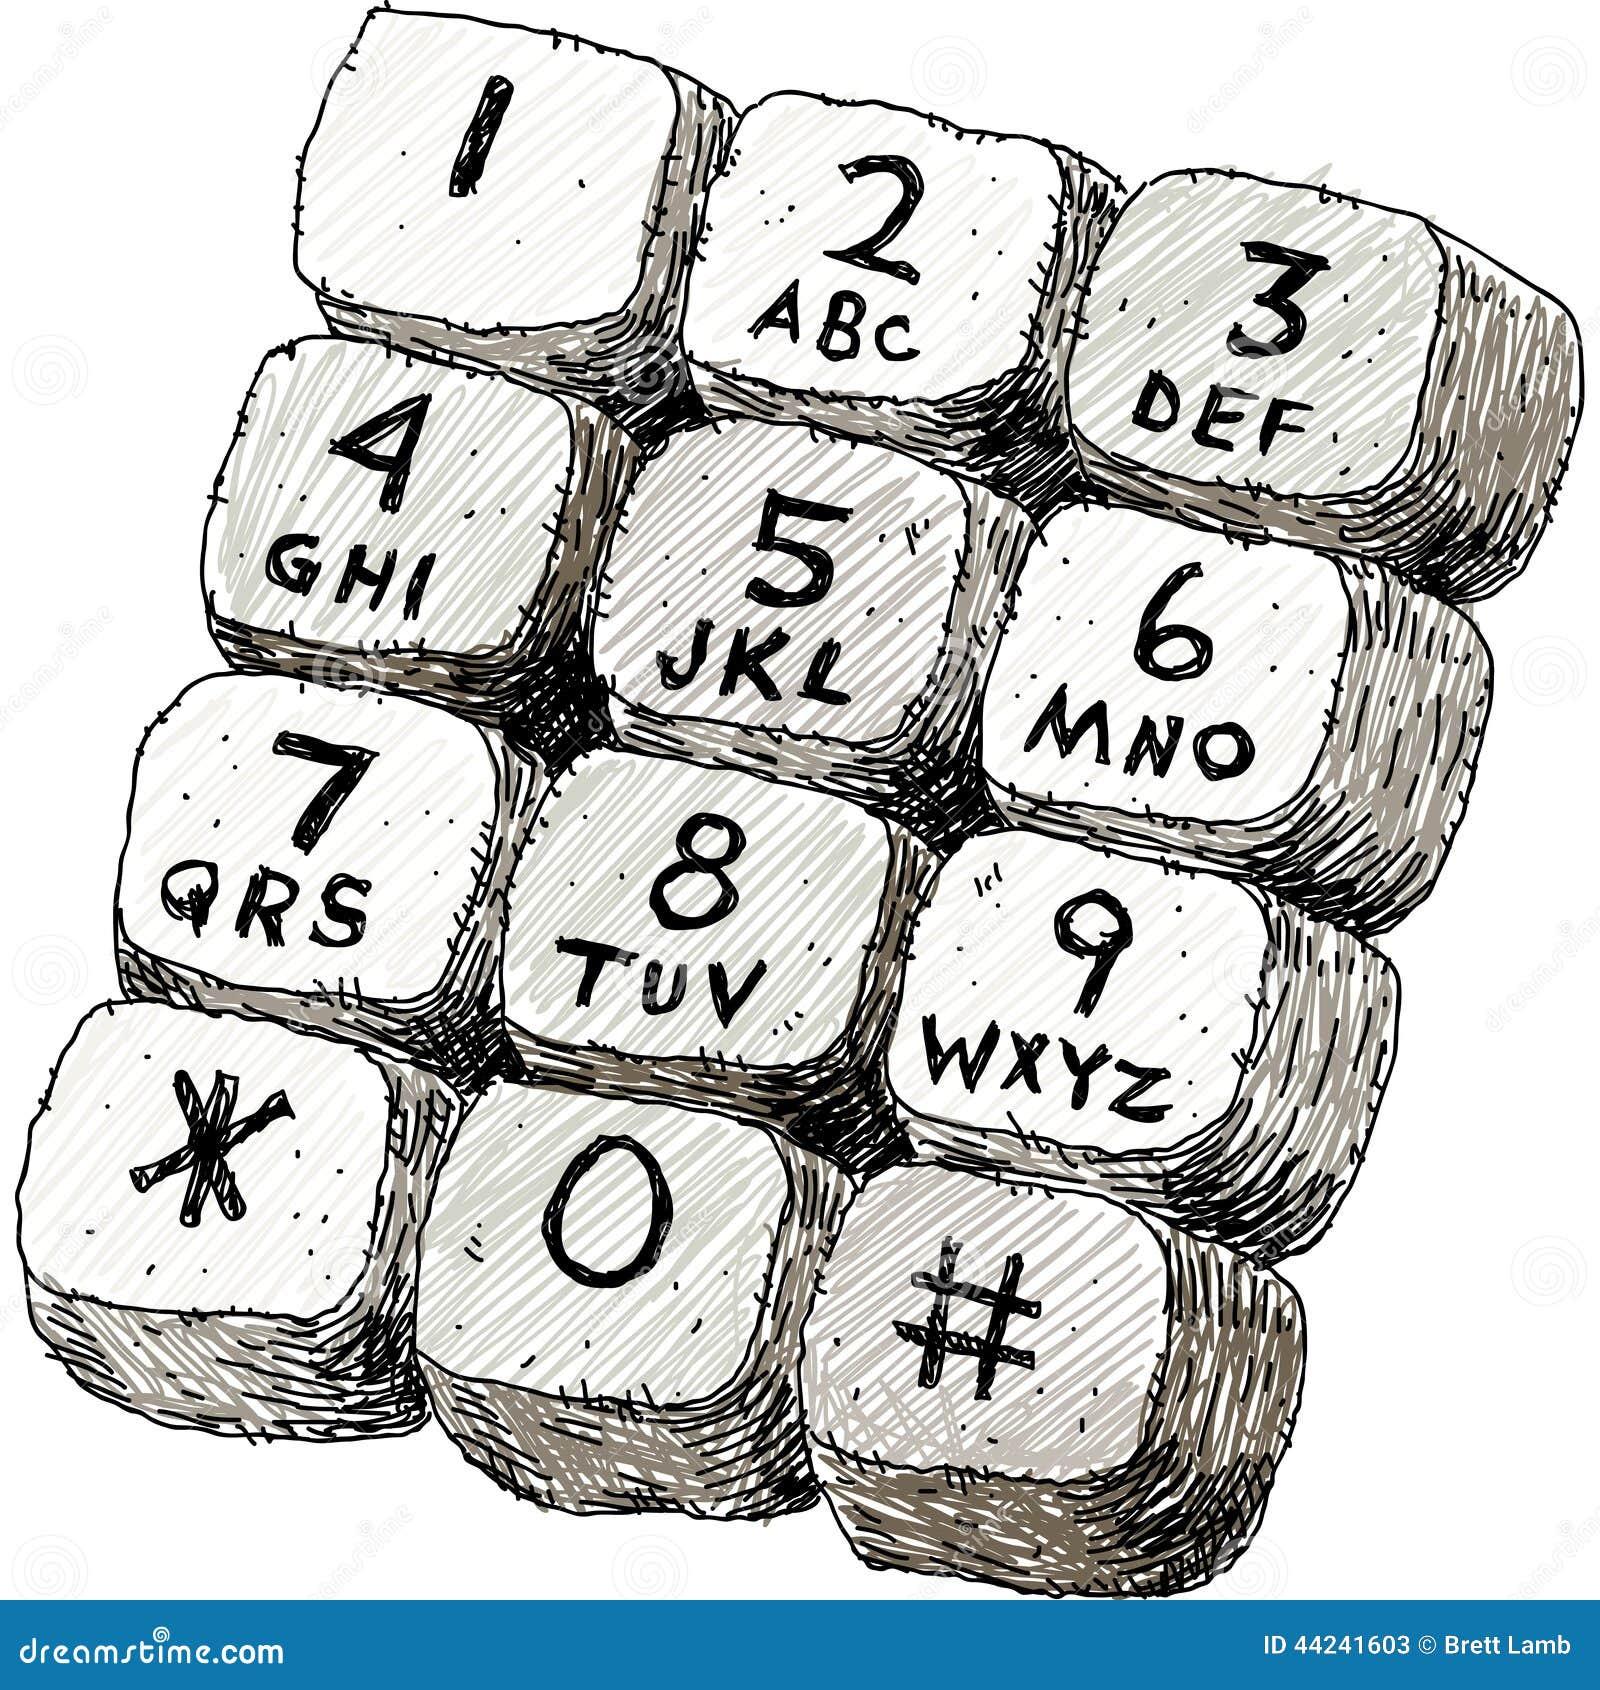 touch tone keypad